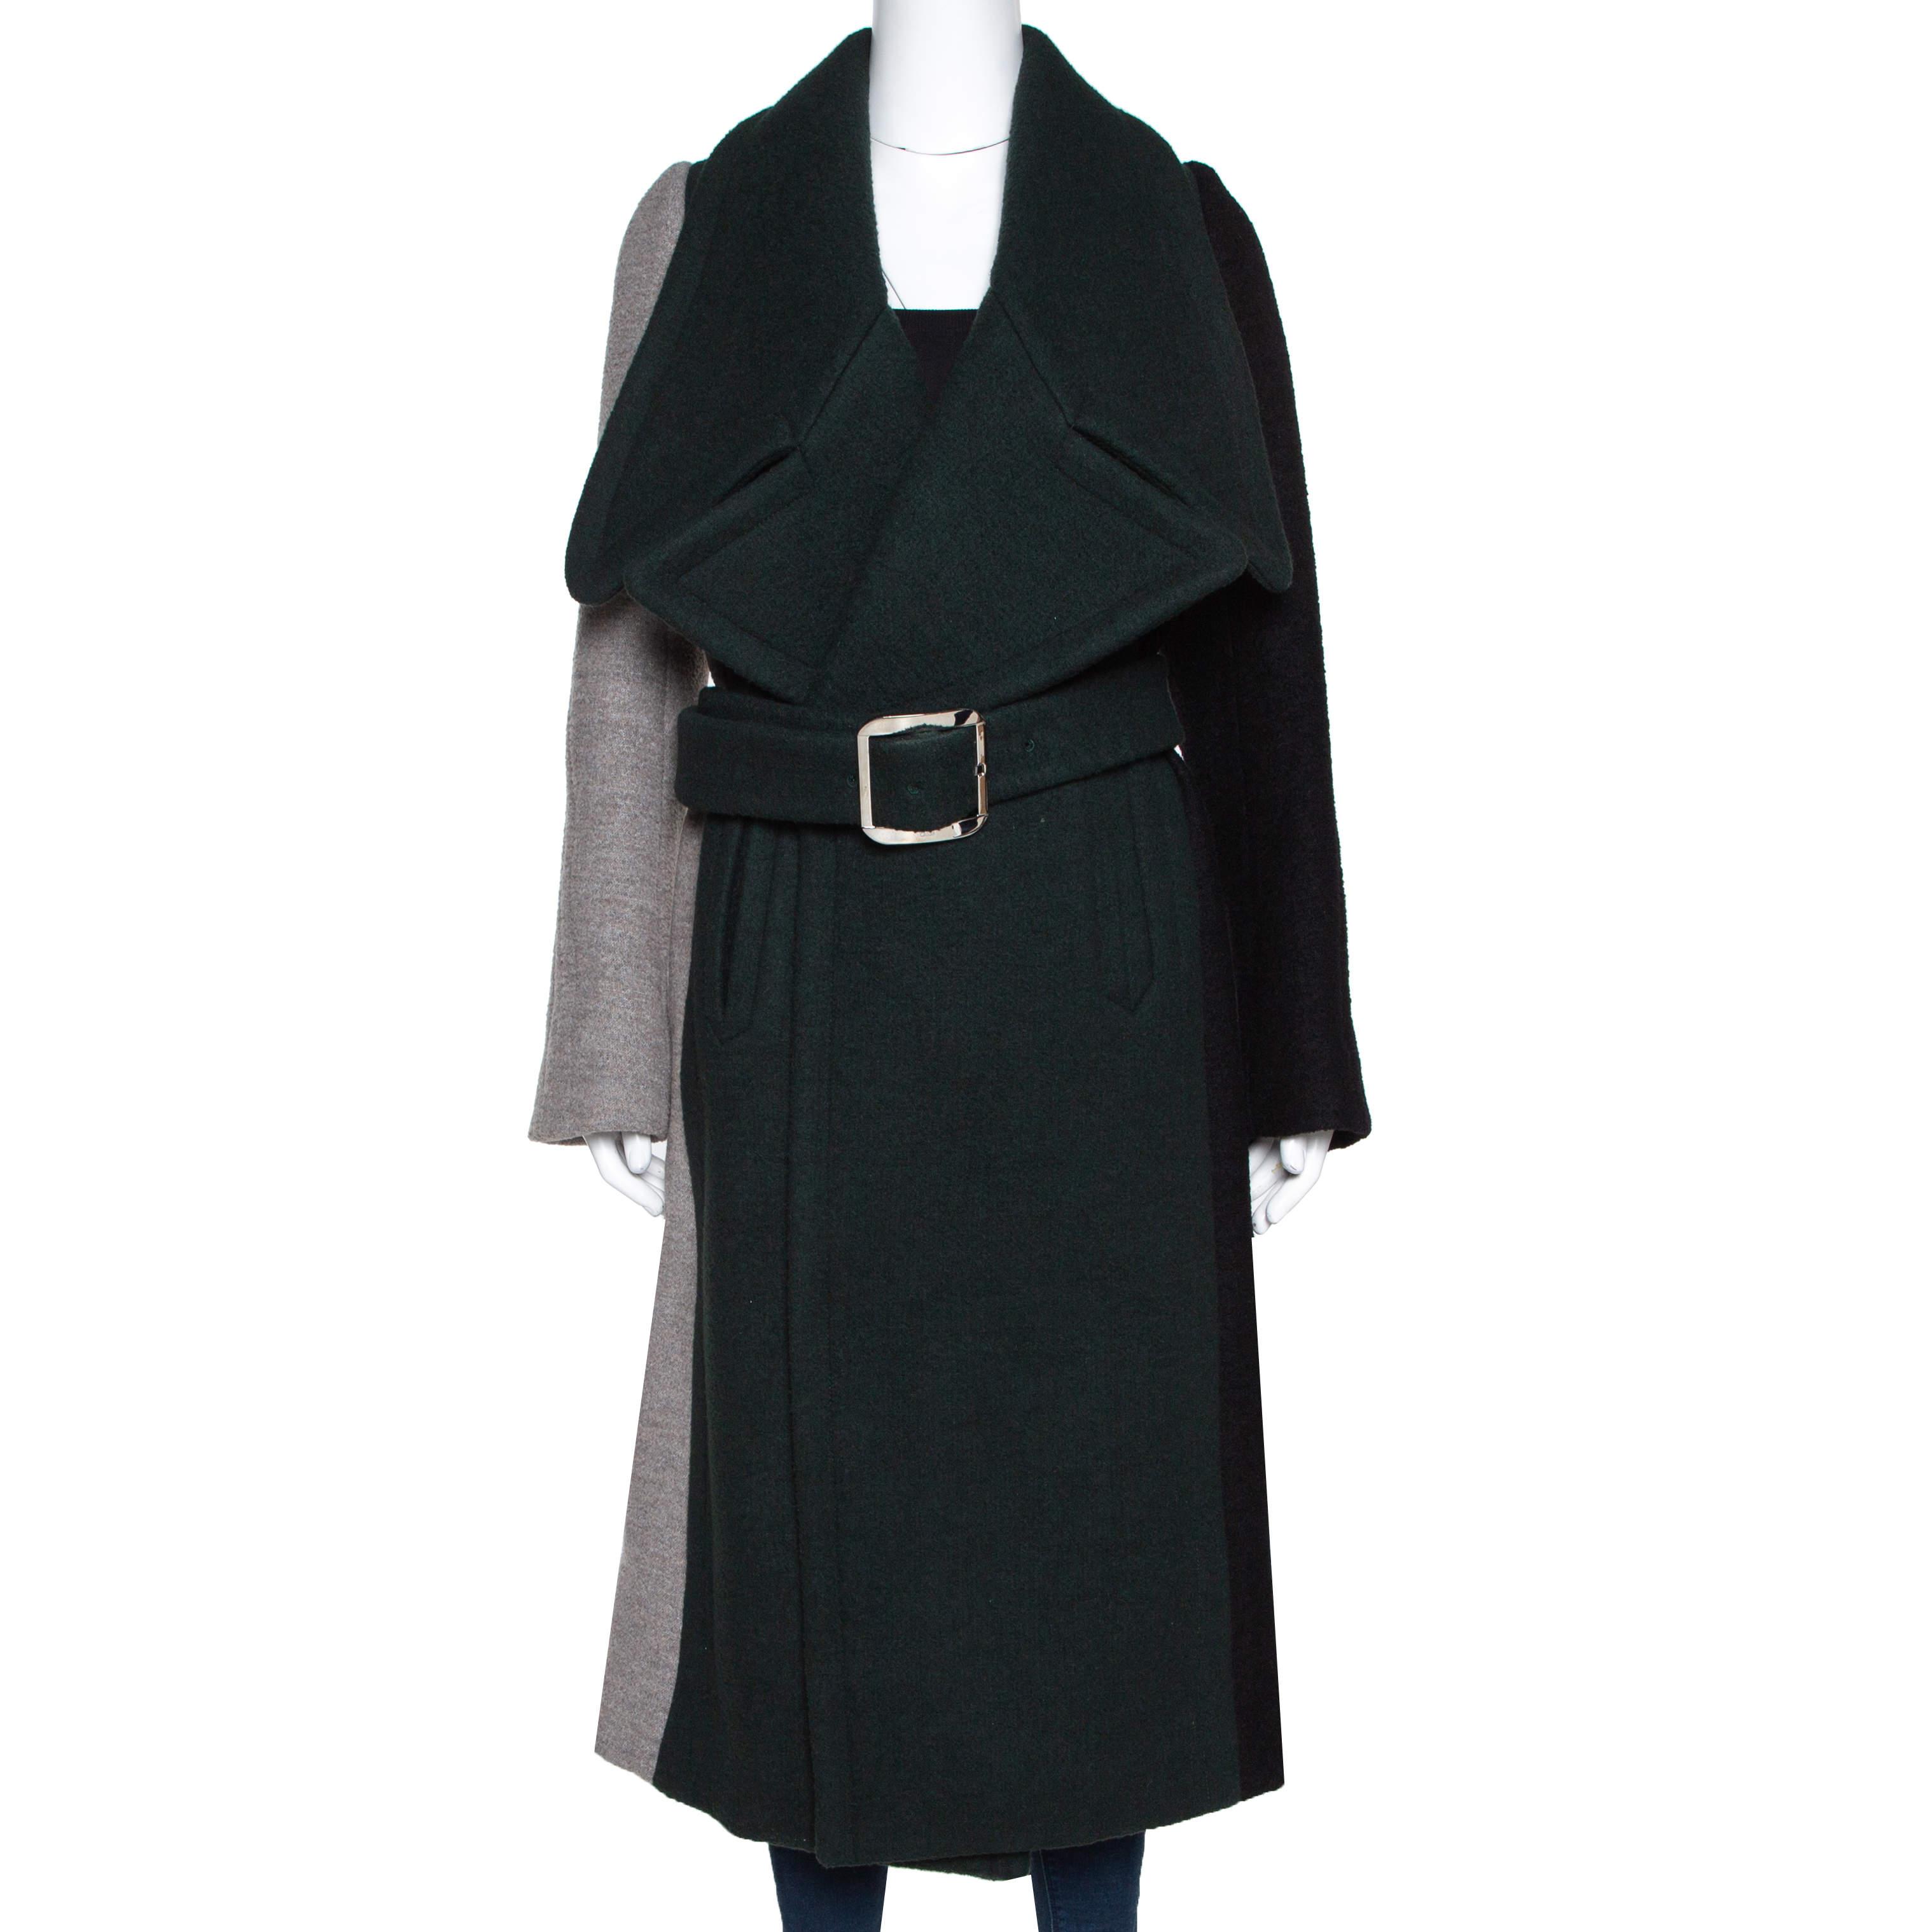 Chloé Colorblock Wool Blend Belted Long Coat M